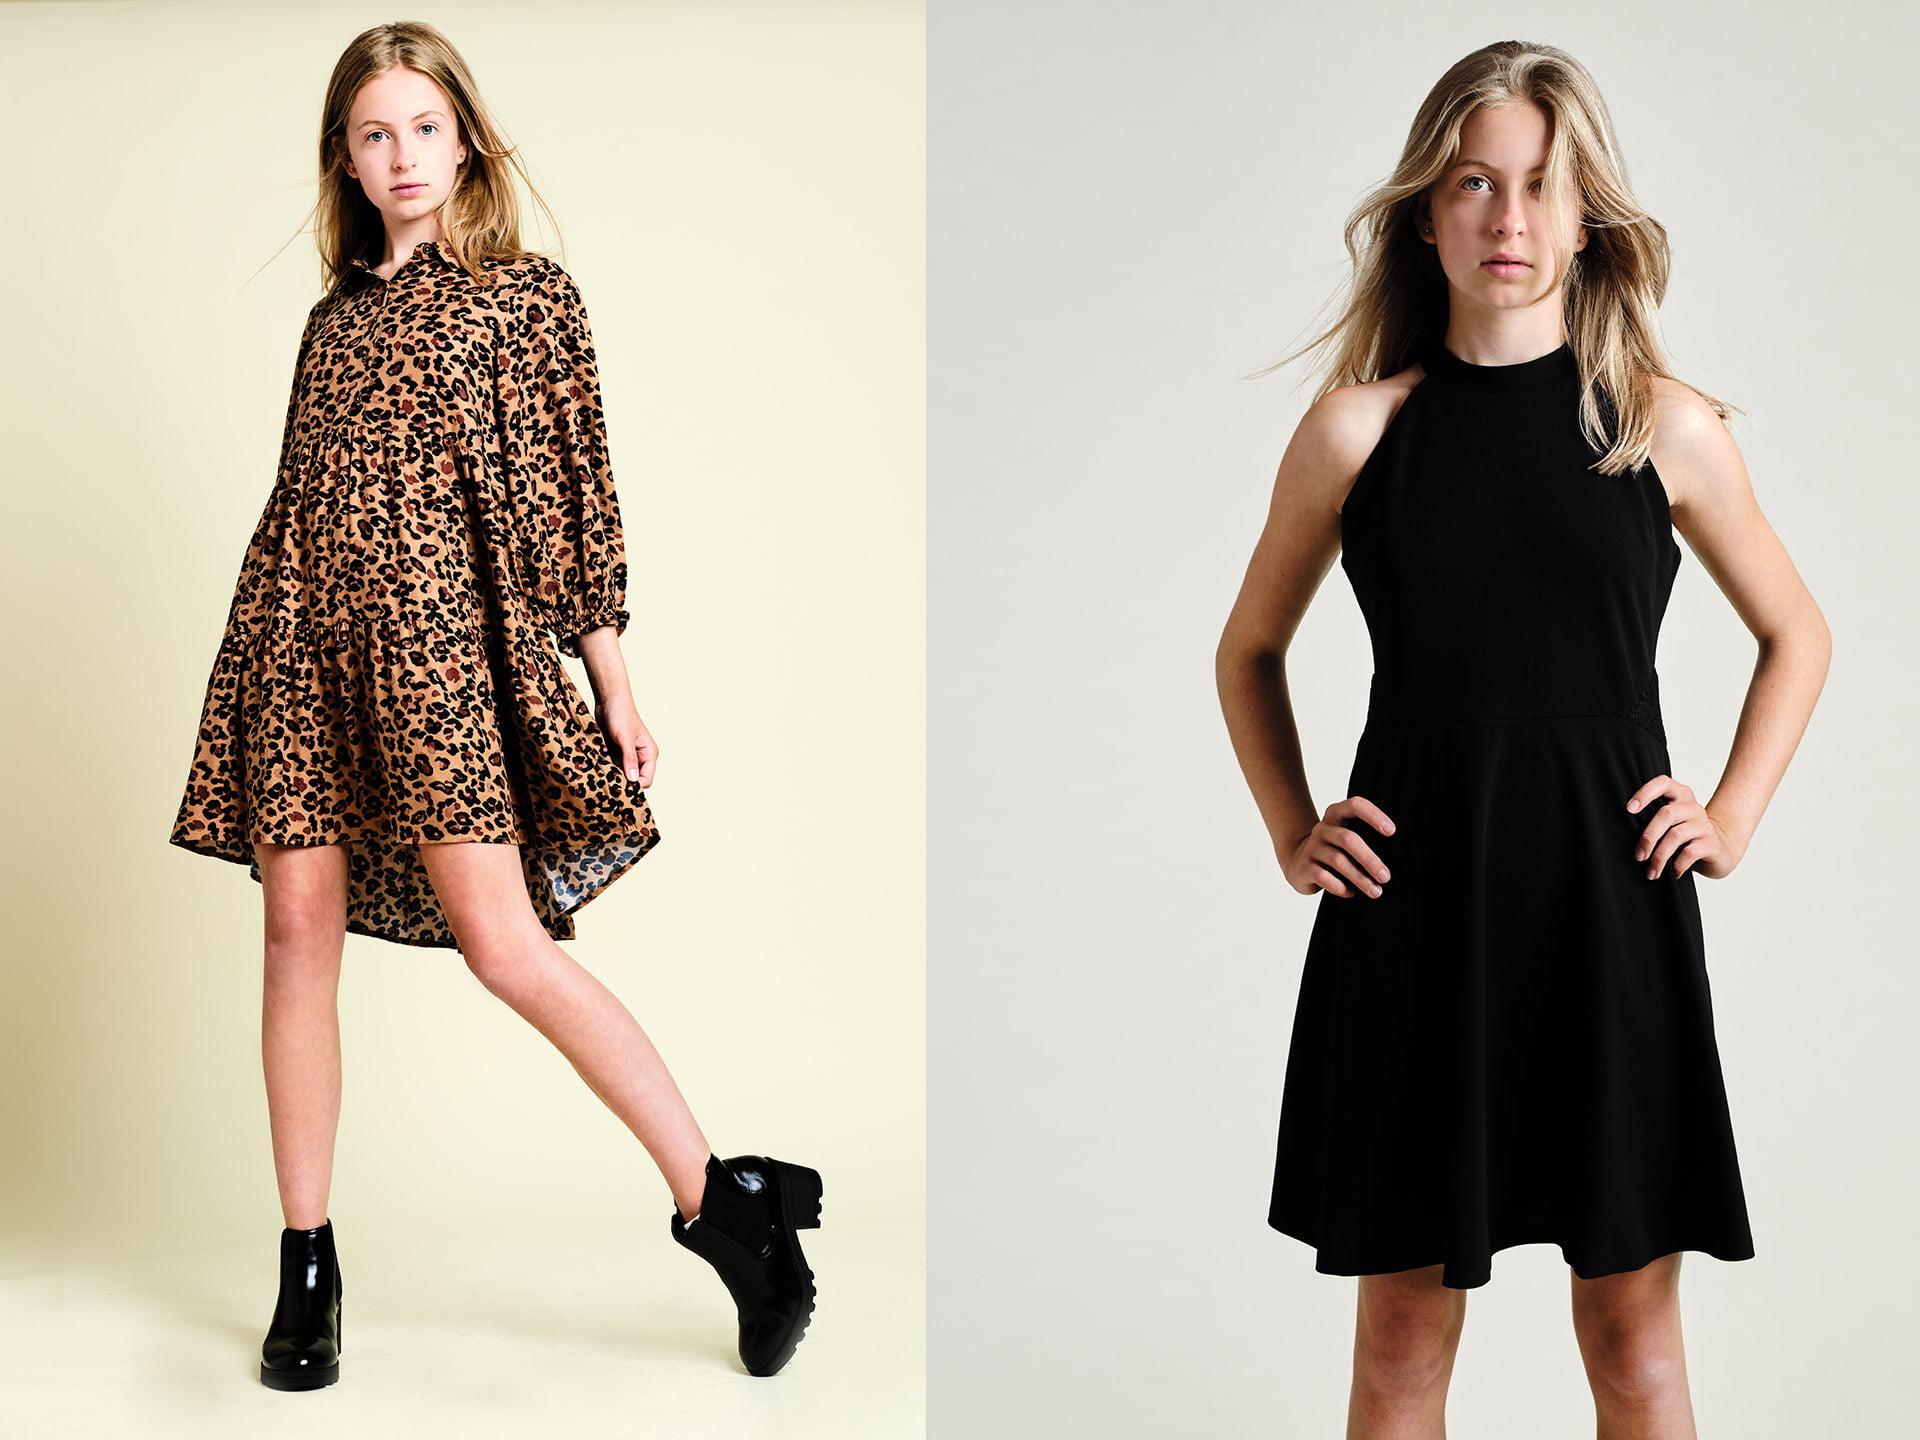 kids-model-photographer-brighton